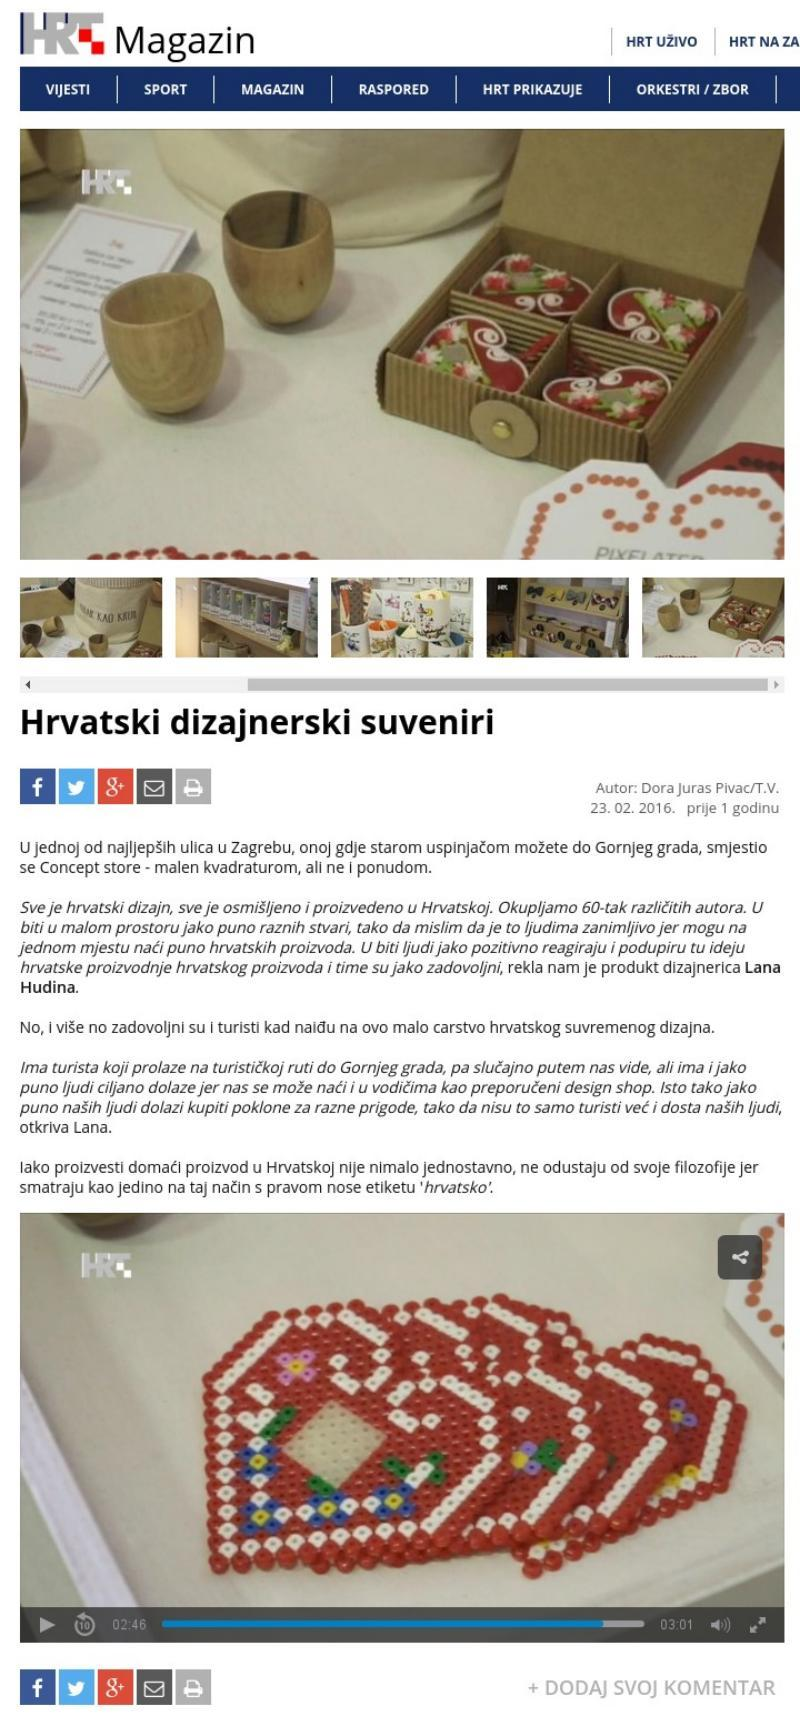 HRT magazin - hrvatski dizajnerski suveniri